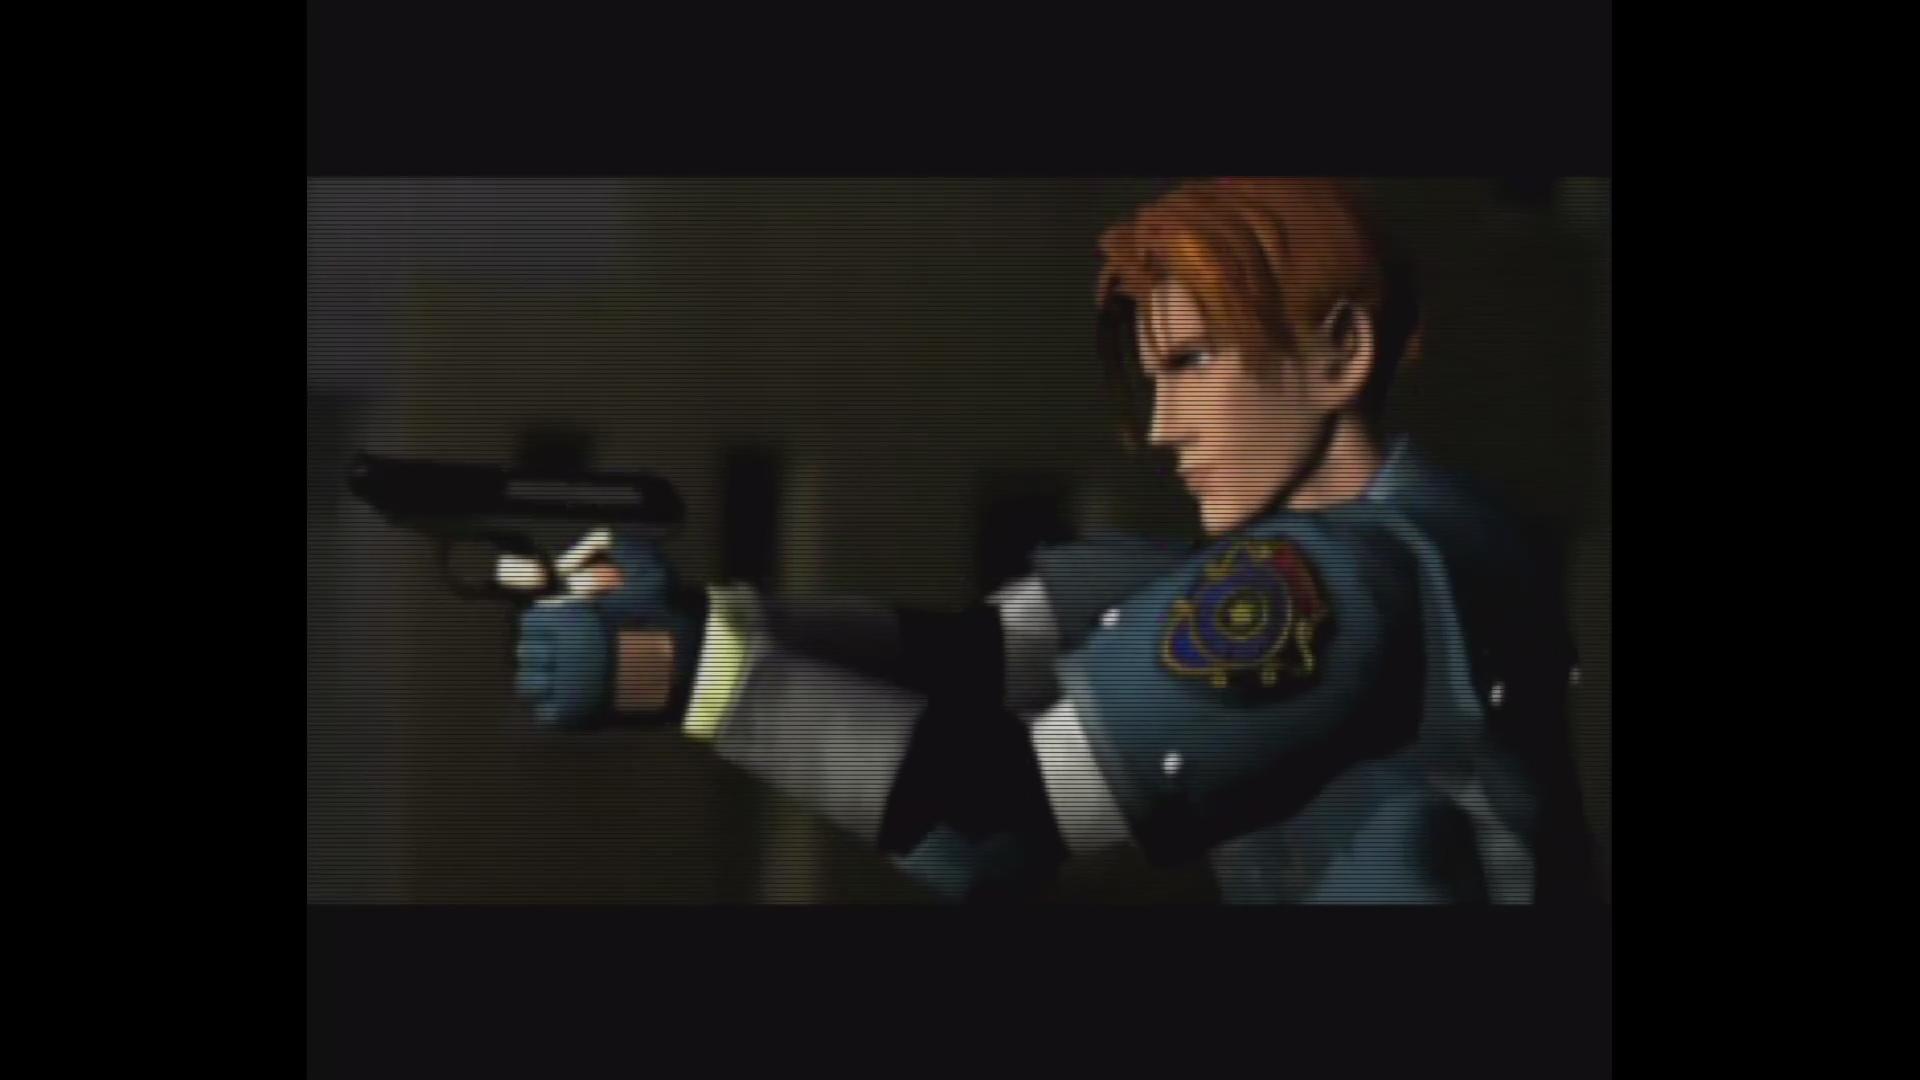 Leon.jpg